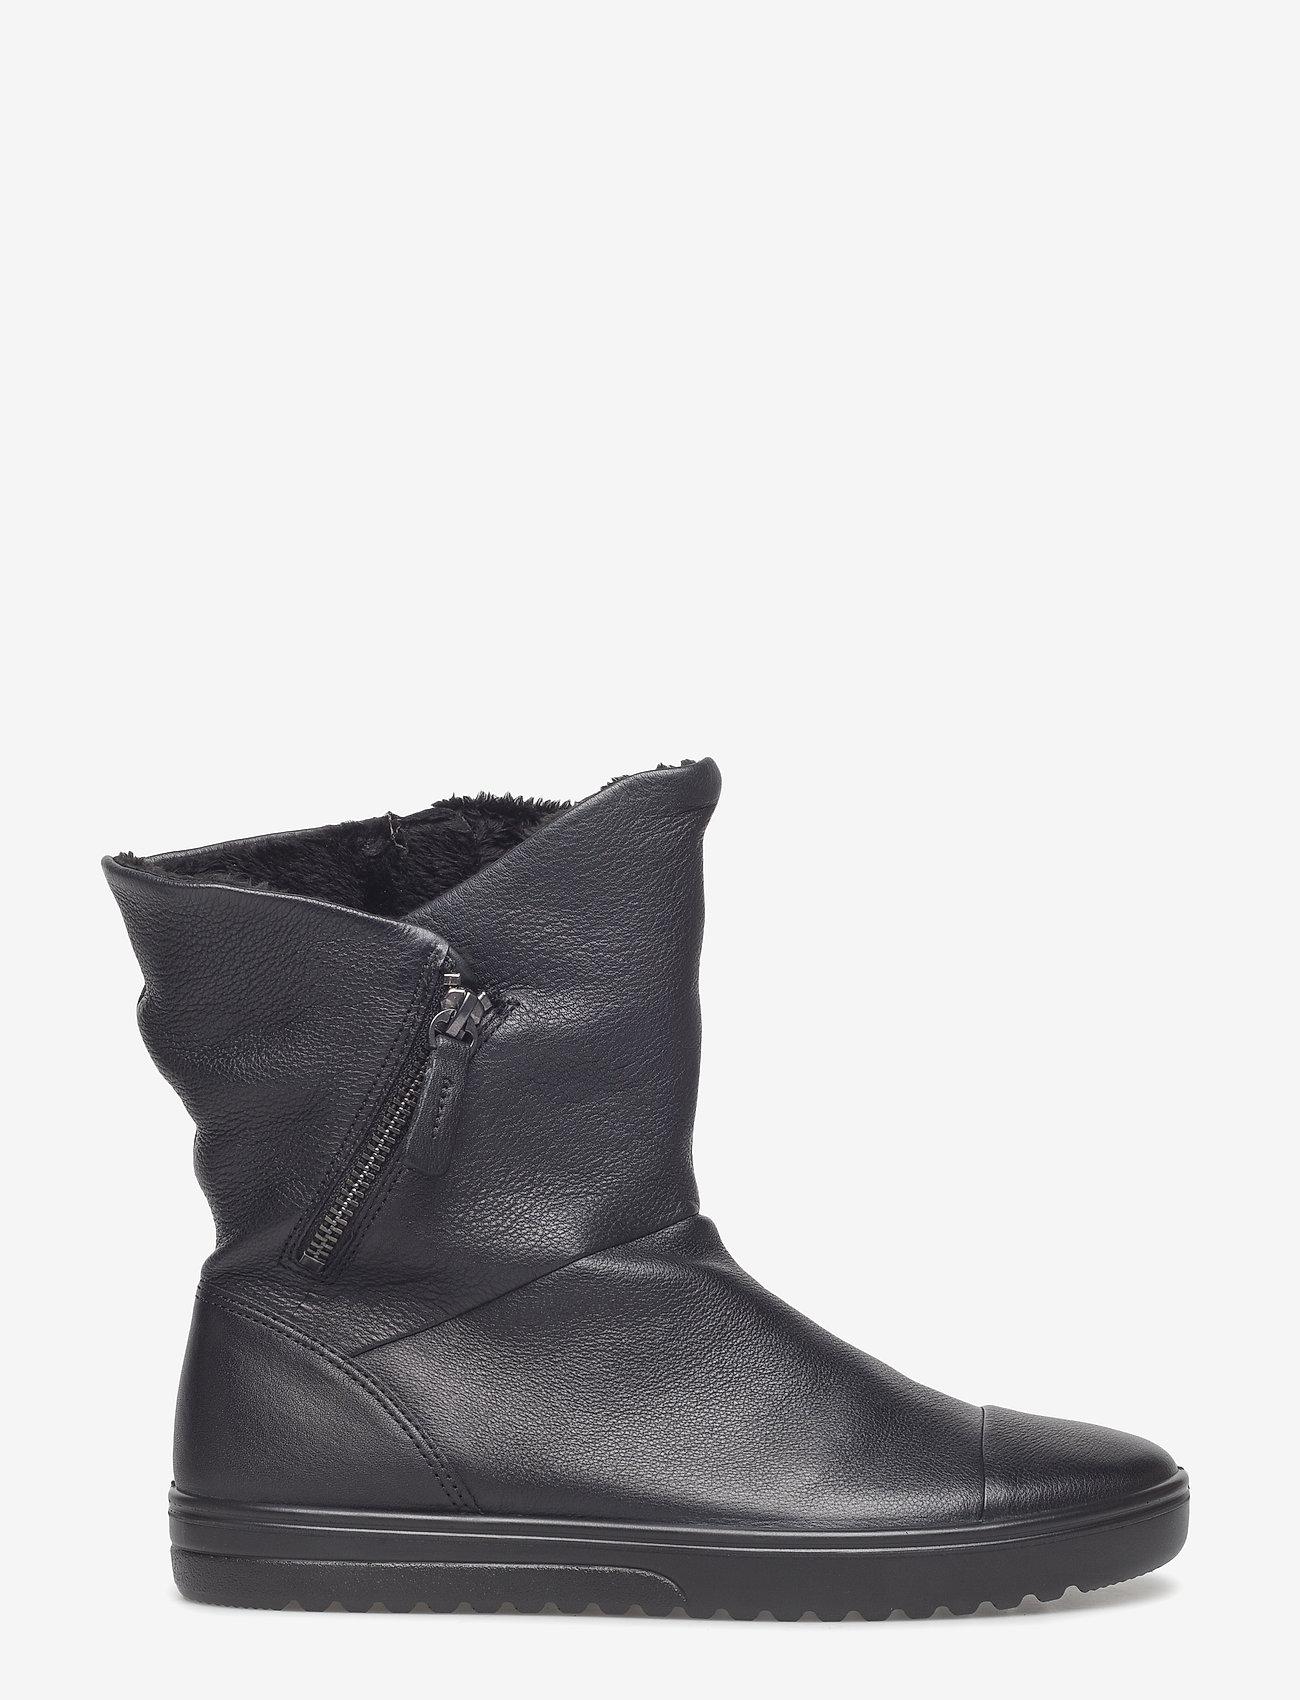 ECCO - FARA - flade ankelstøvler - black - 0